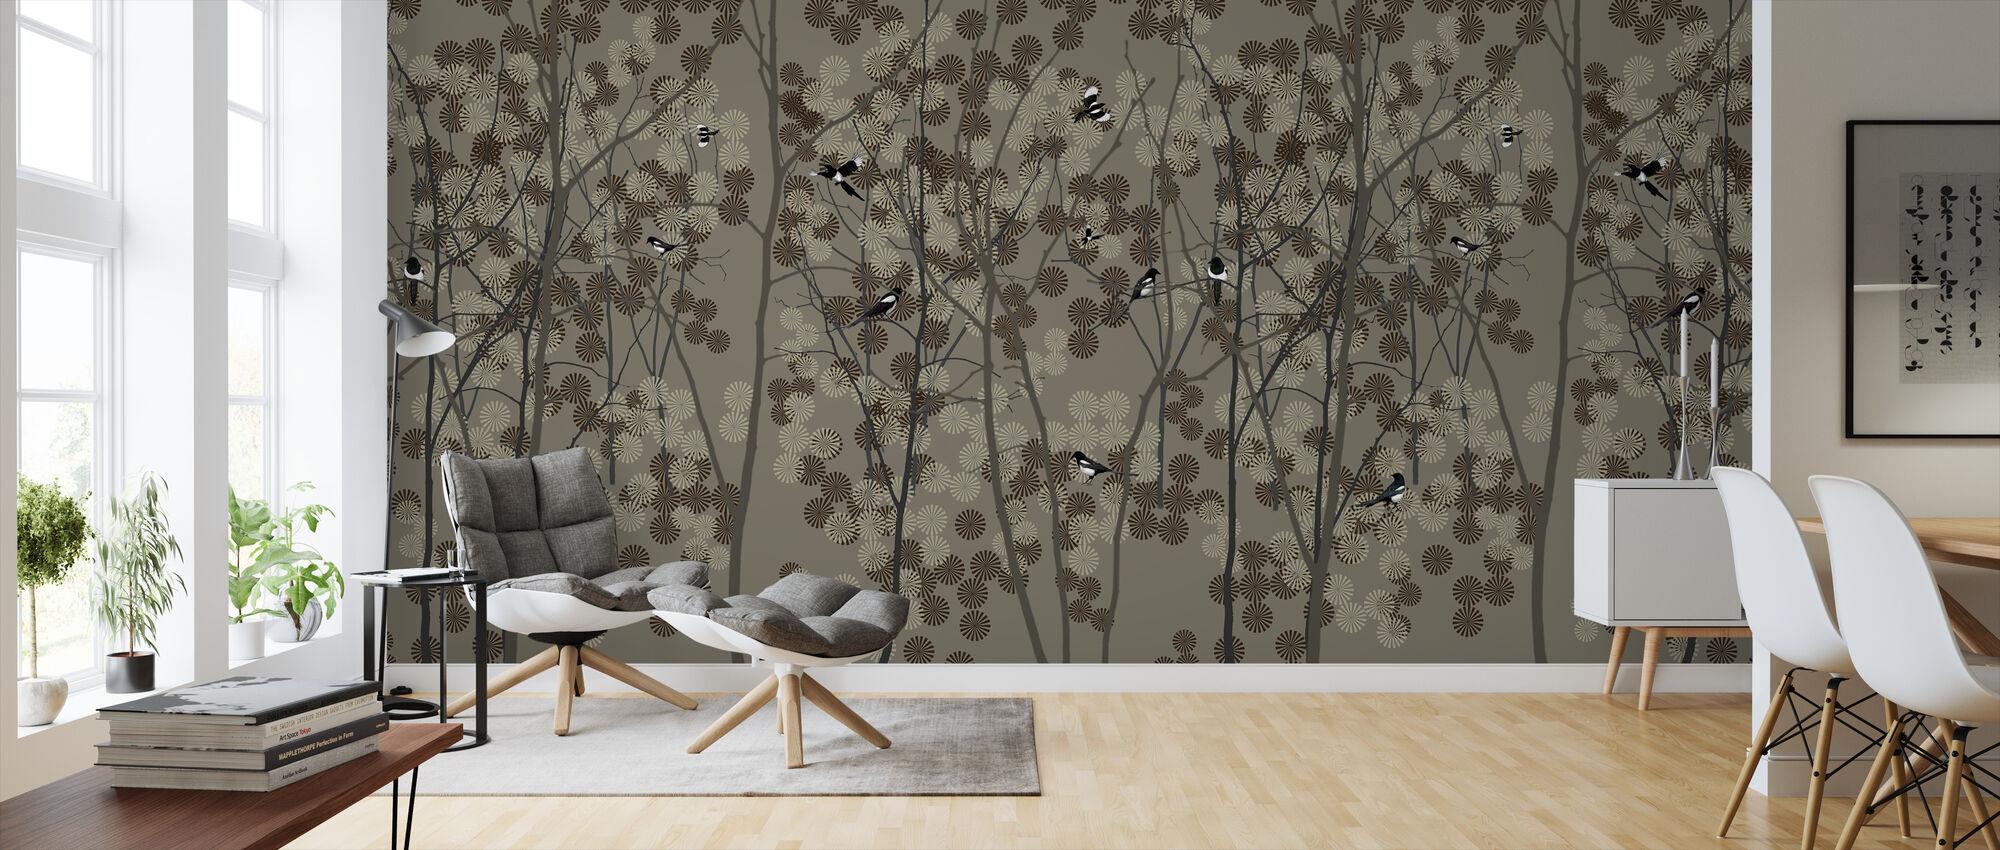 October Magpie - Wallpaper - Living Room